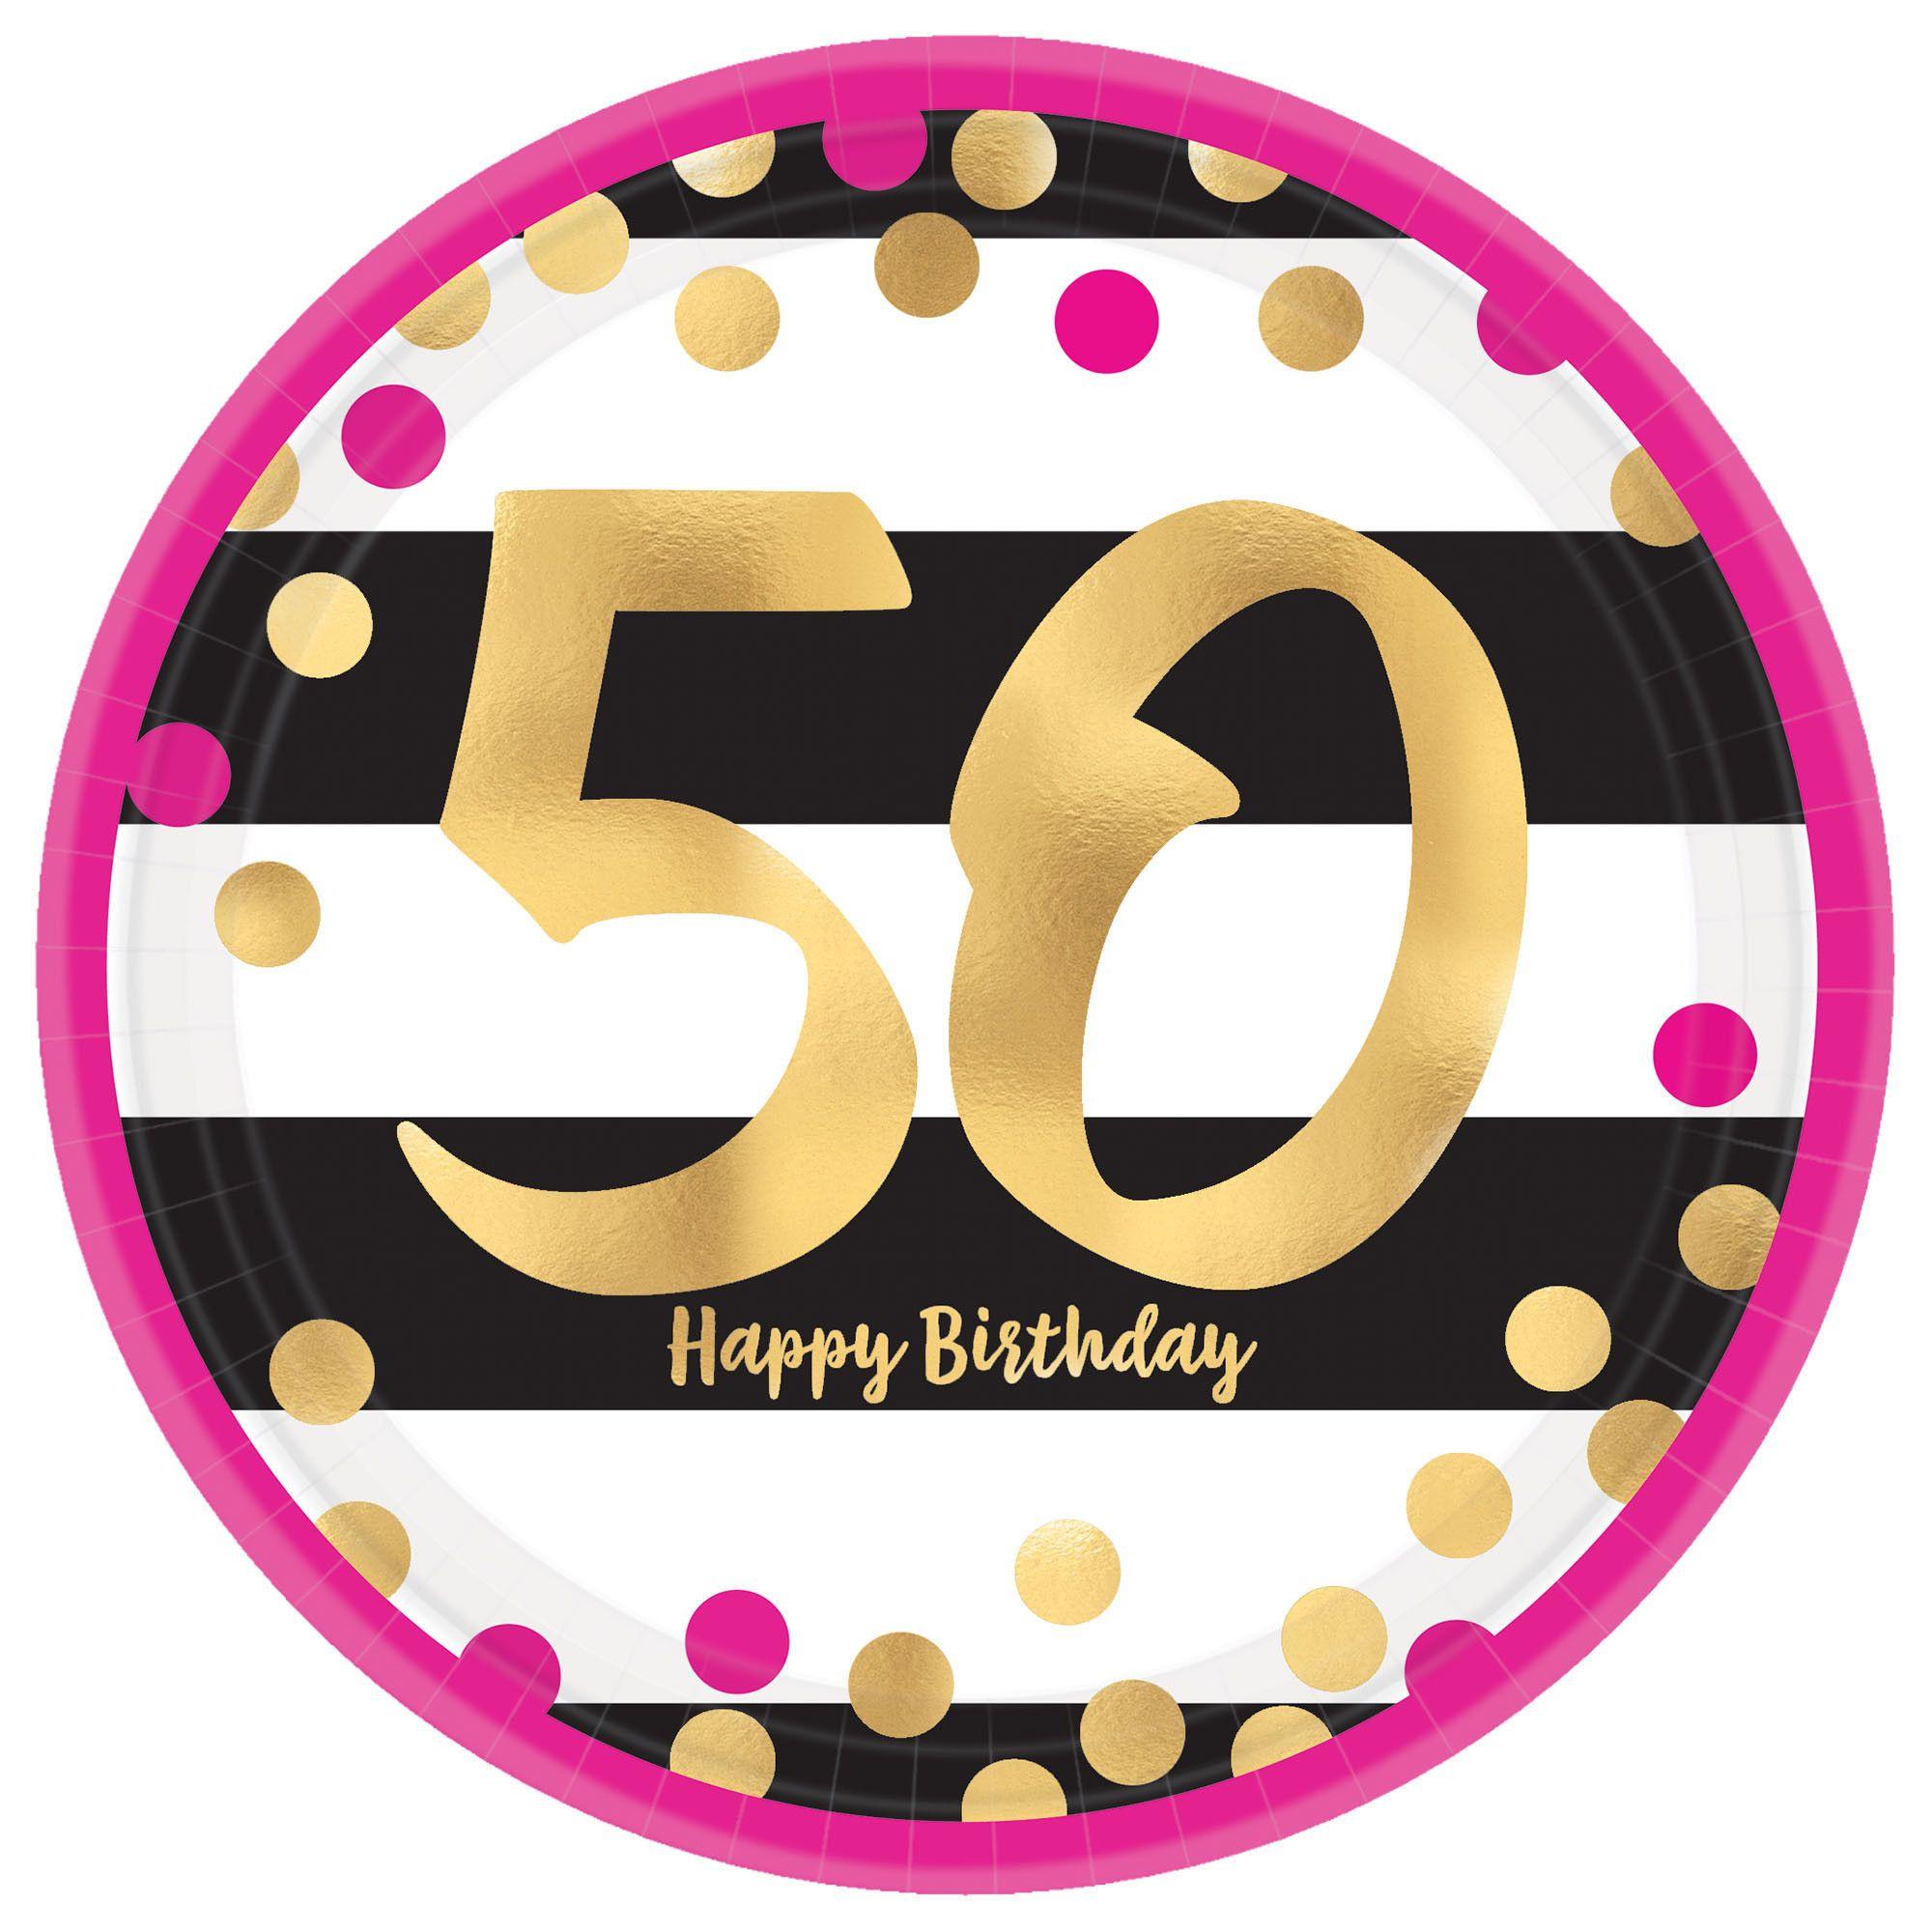 Pink & Gold Milestone 50 9